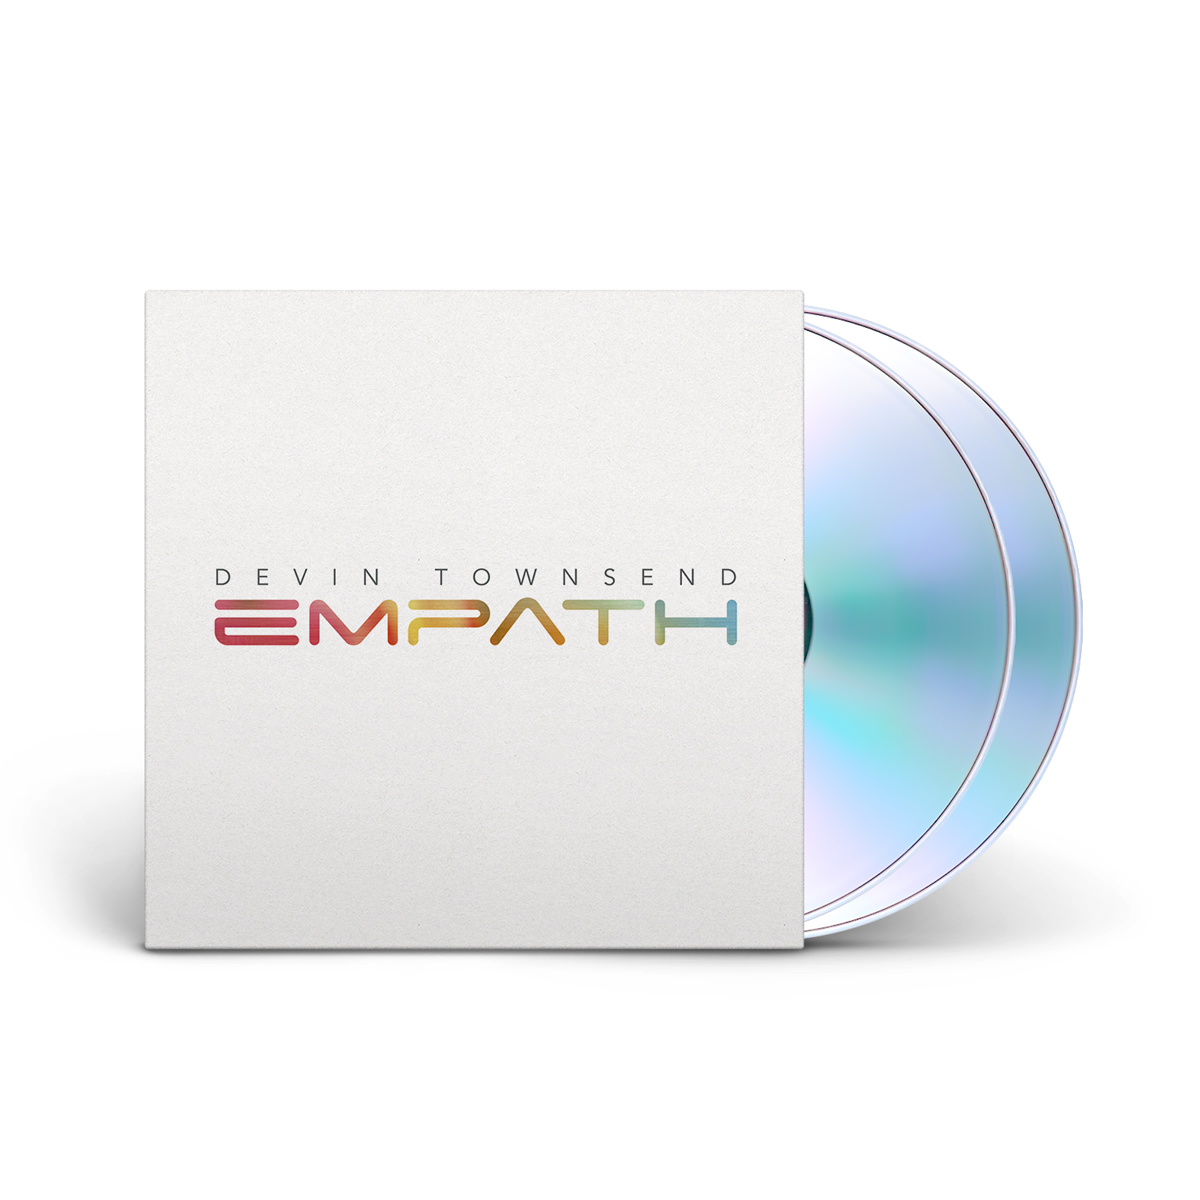 Devin Townsend - Empath 2 CD